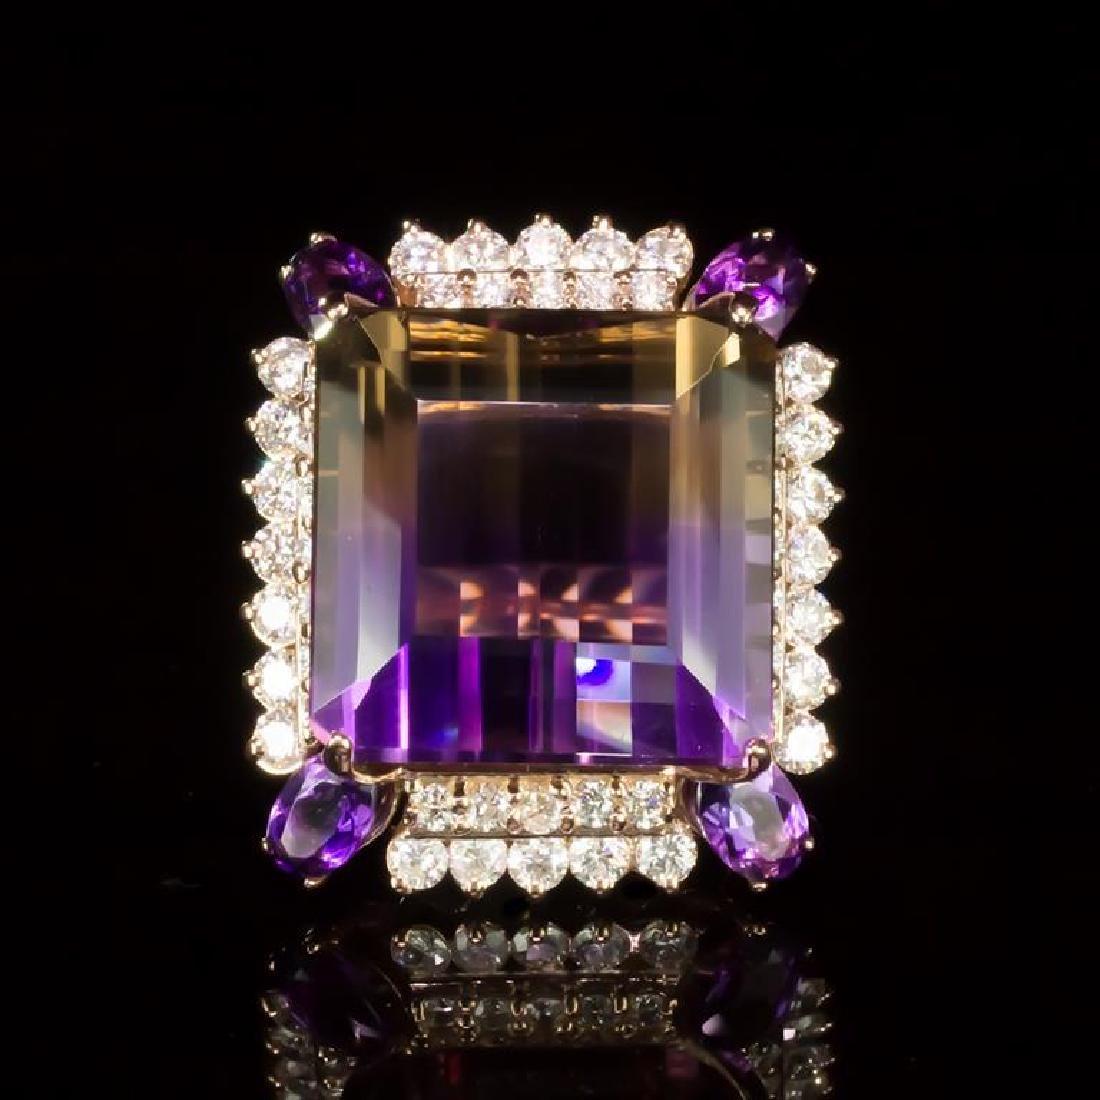 14K Gold 26.70 Ametrine, 2.28ct Amethyst 2.17ct Diamond